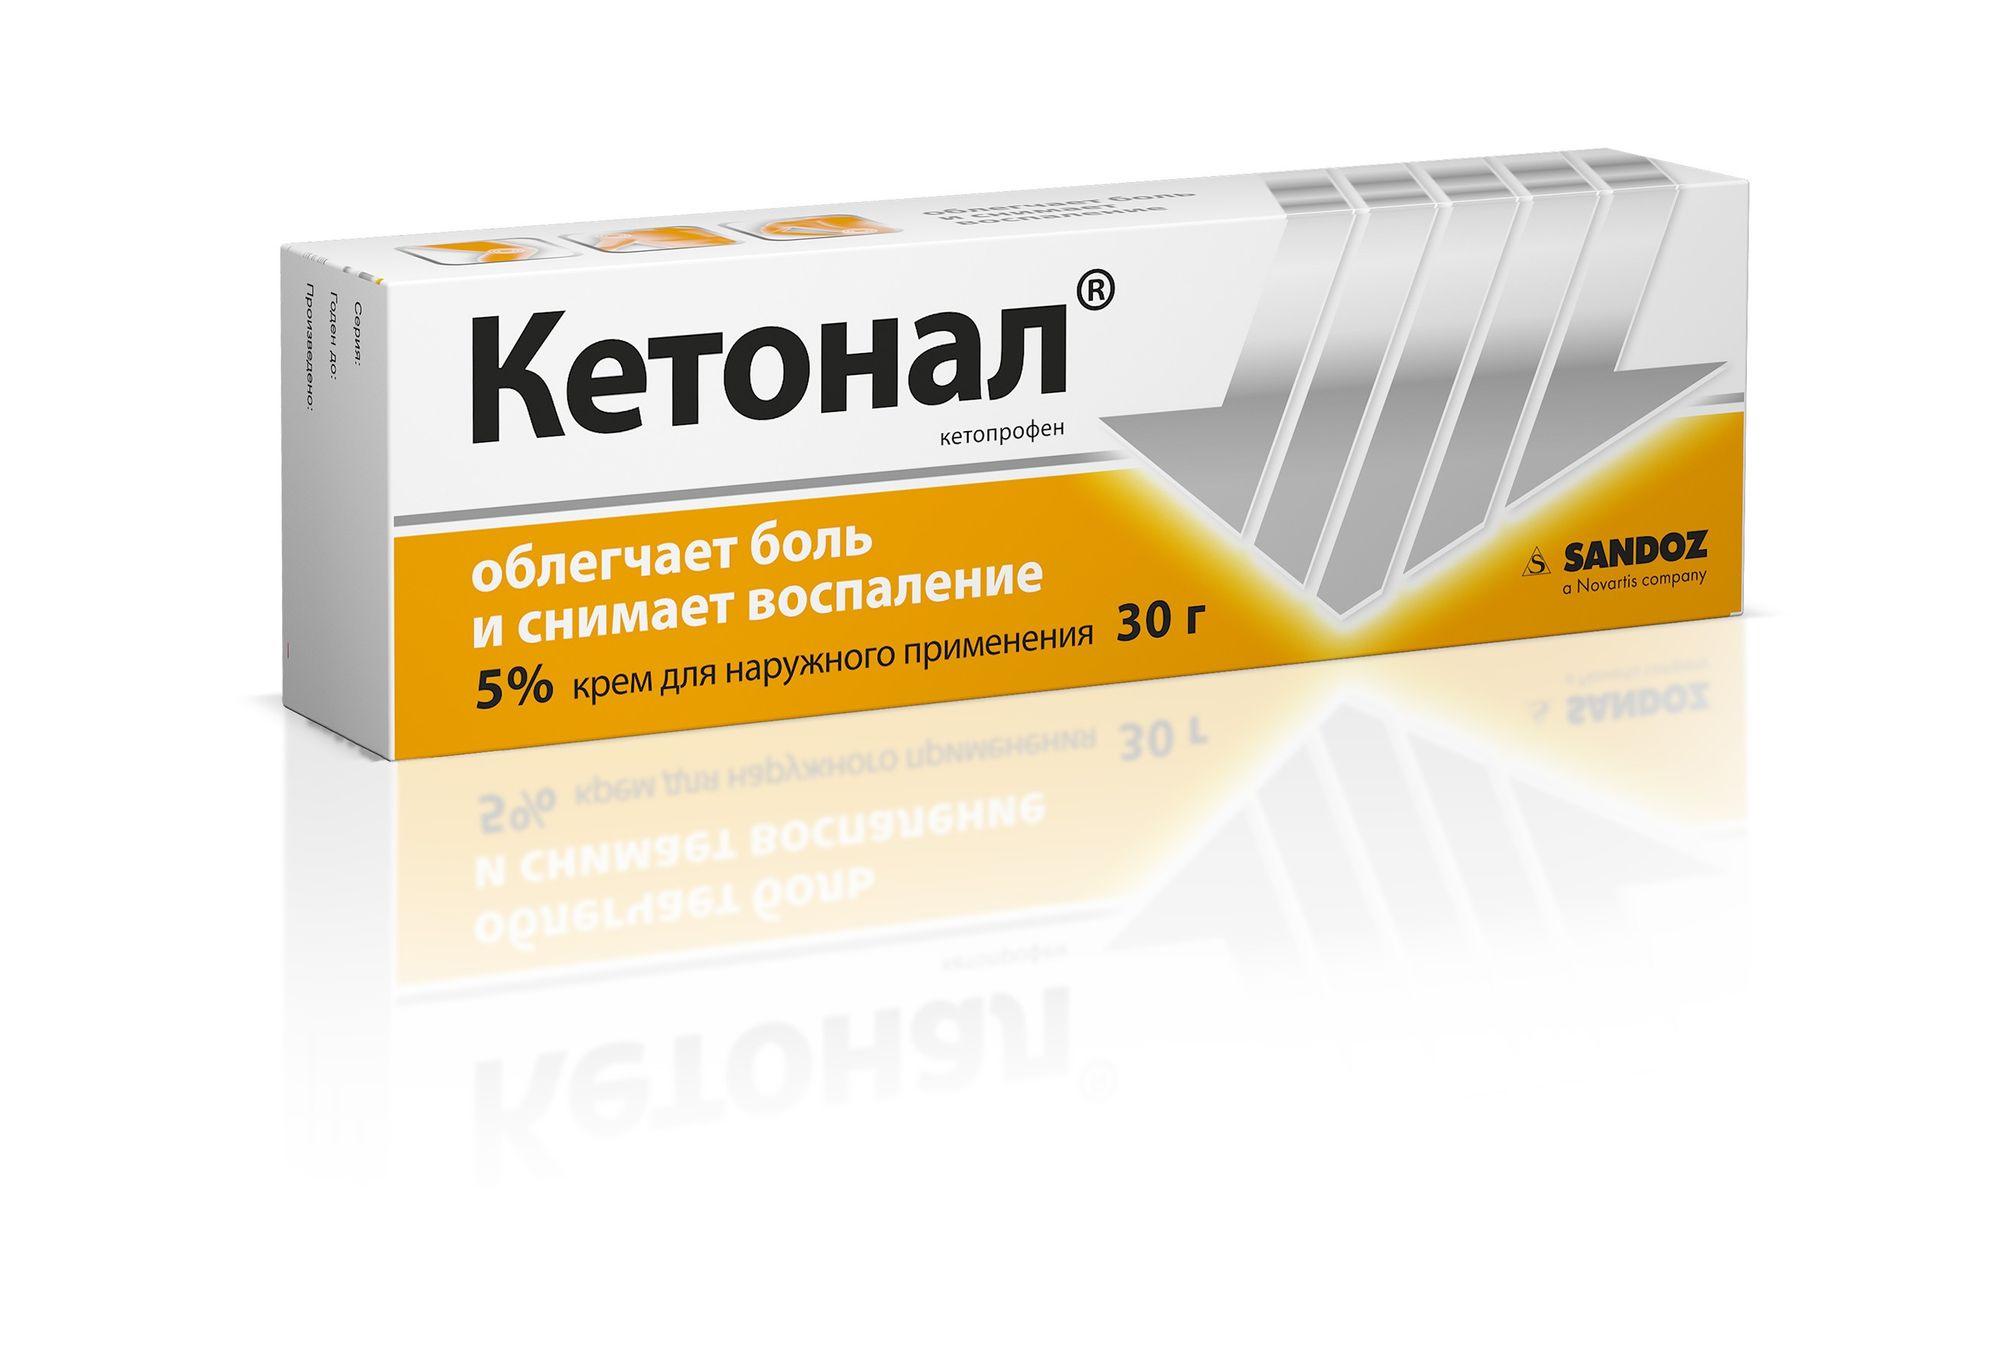 Аналоги геля кетопрофен